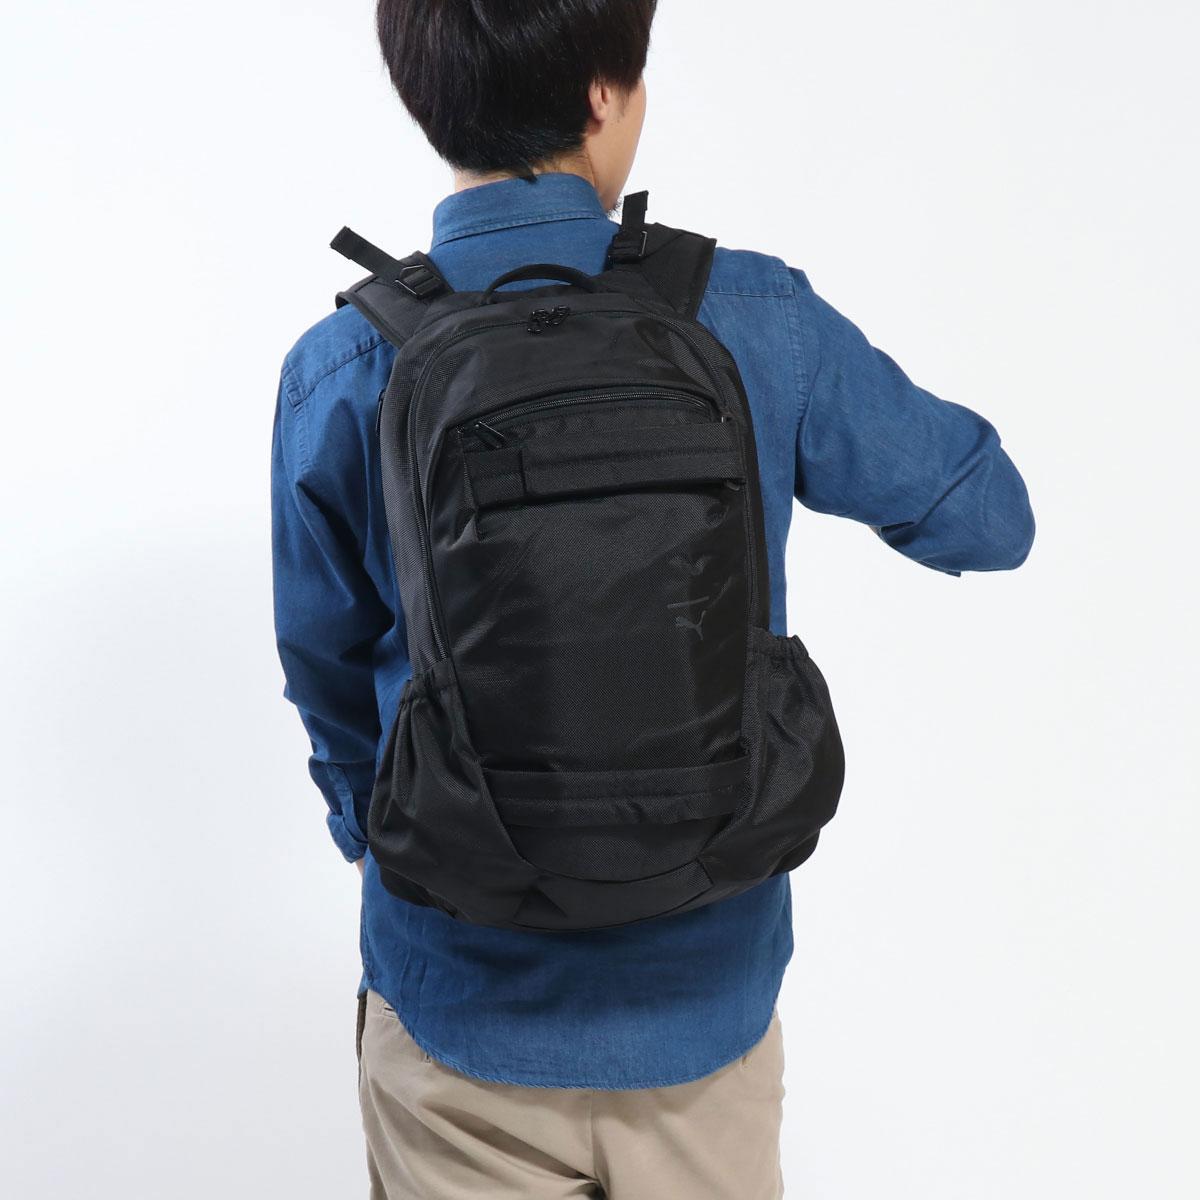 75de2a33f1 GALLERIA Bag-Luggage   SALE 30% OFF  PUMA backpack rucksack mens womens A4  PCStorage commuting to school Street Fashion 075450